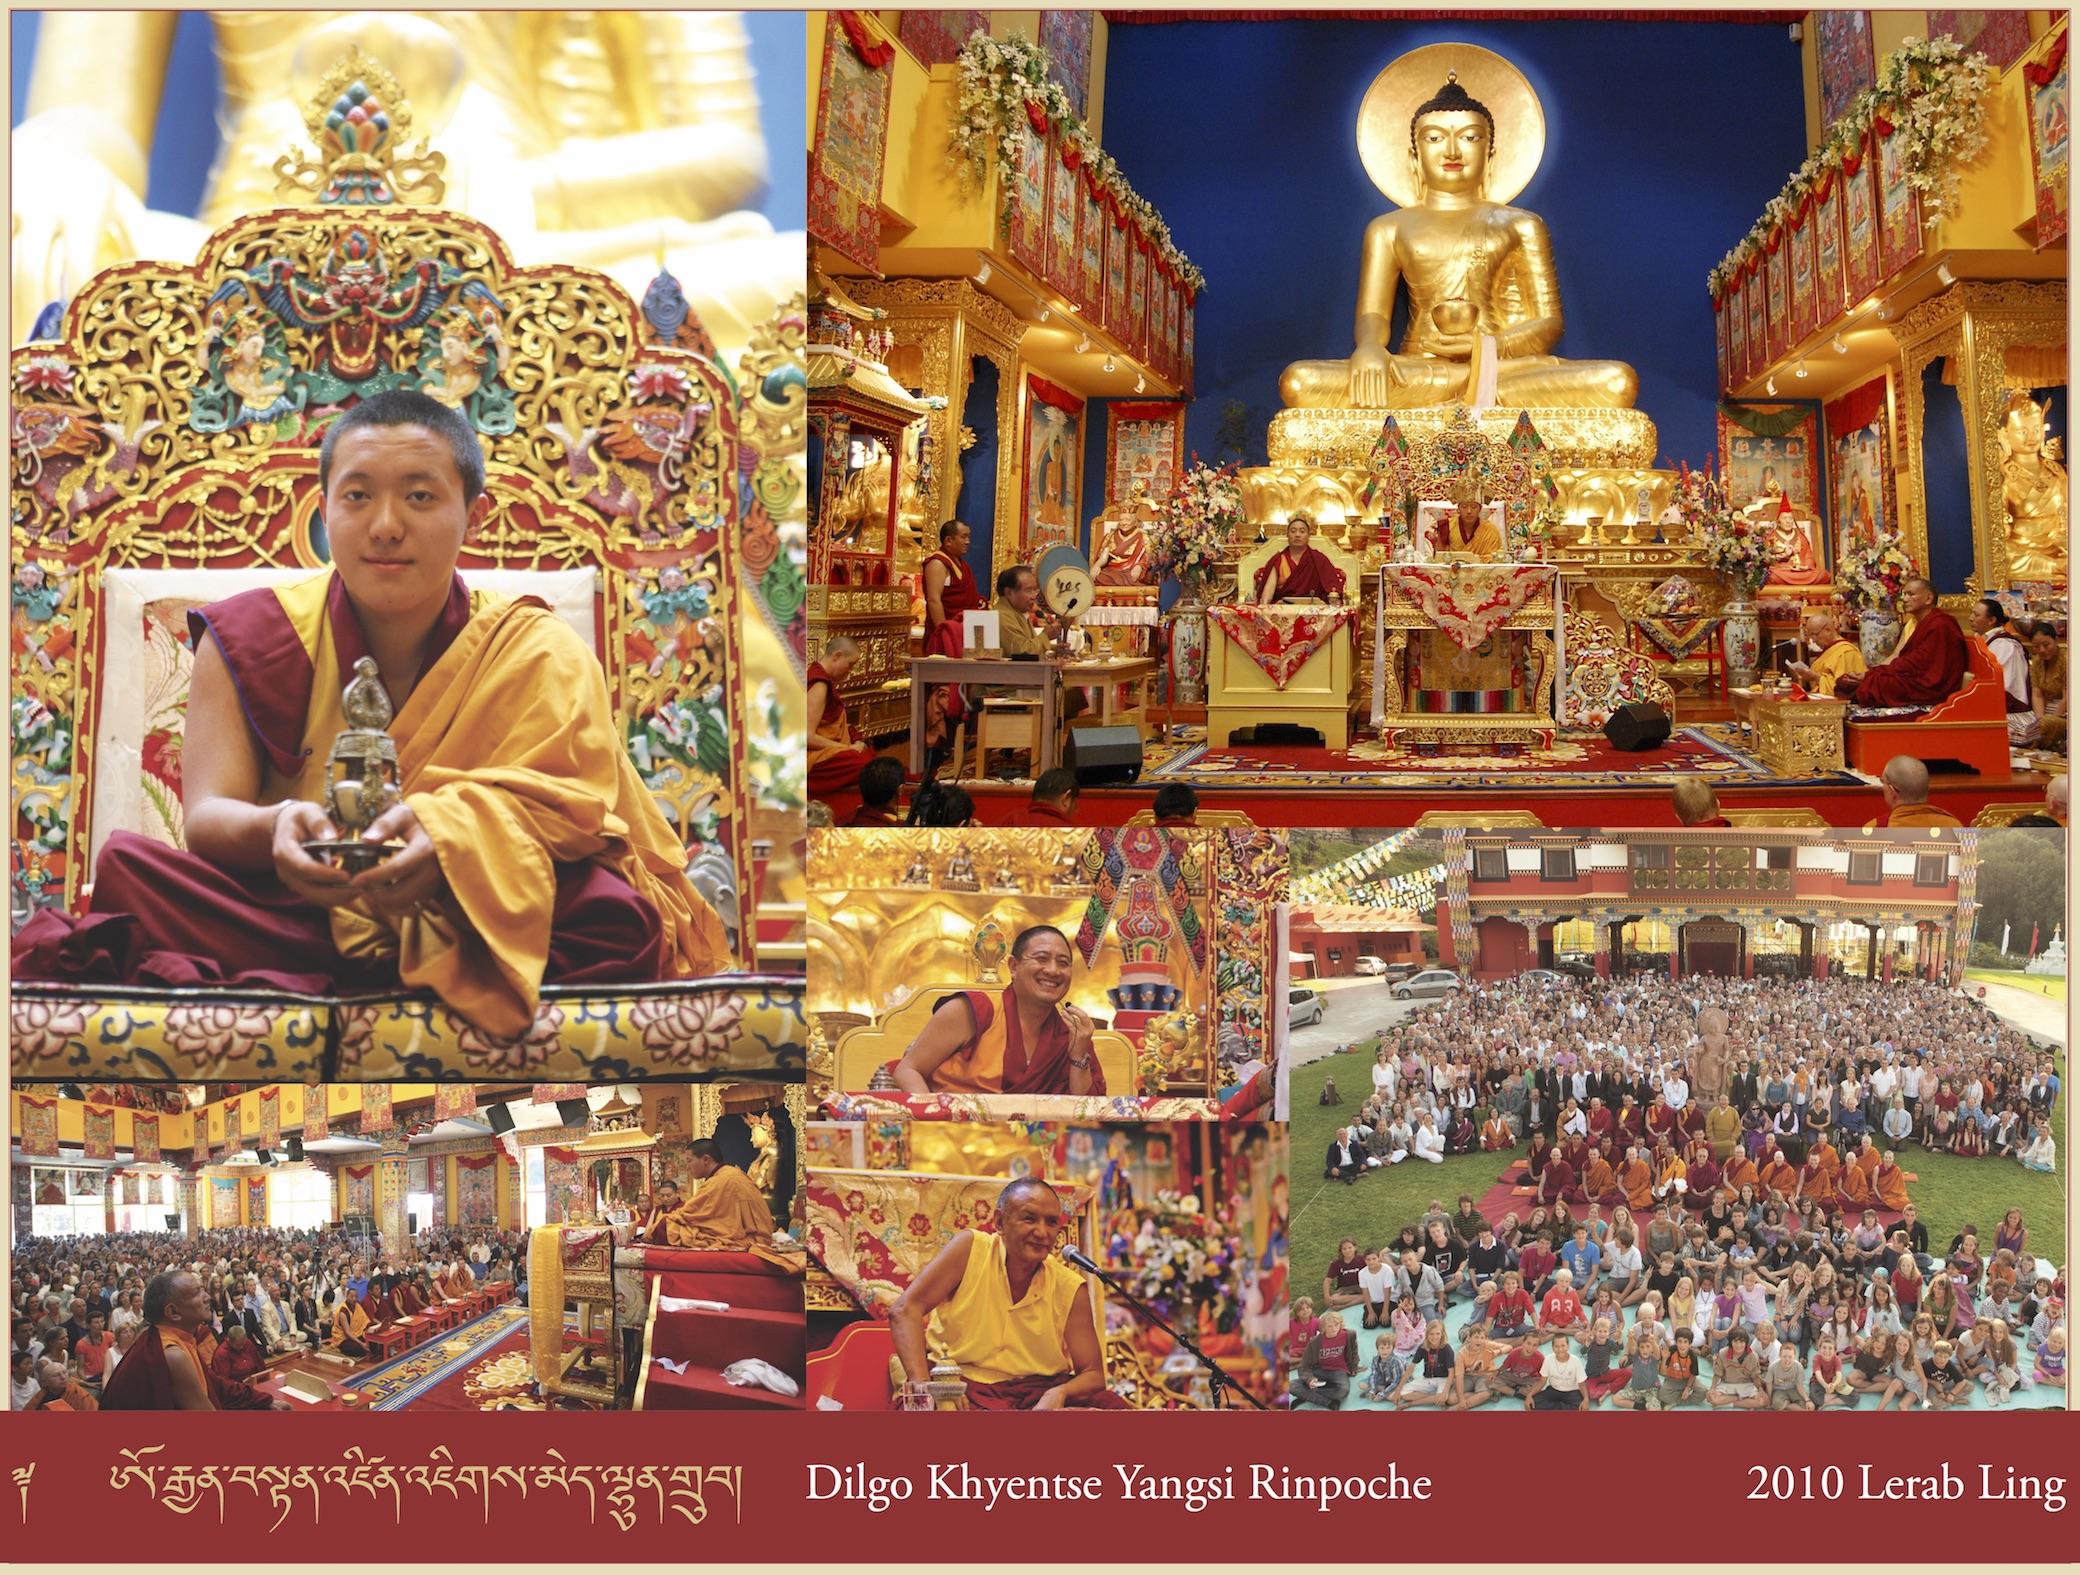 Dilgo Khyentse Yangsi Rinpoche, 2010 Lerab Ling